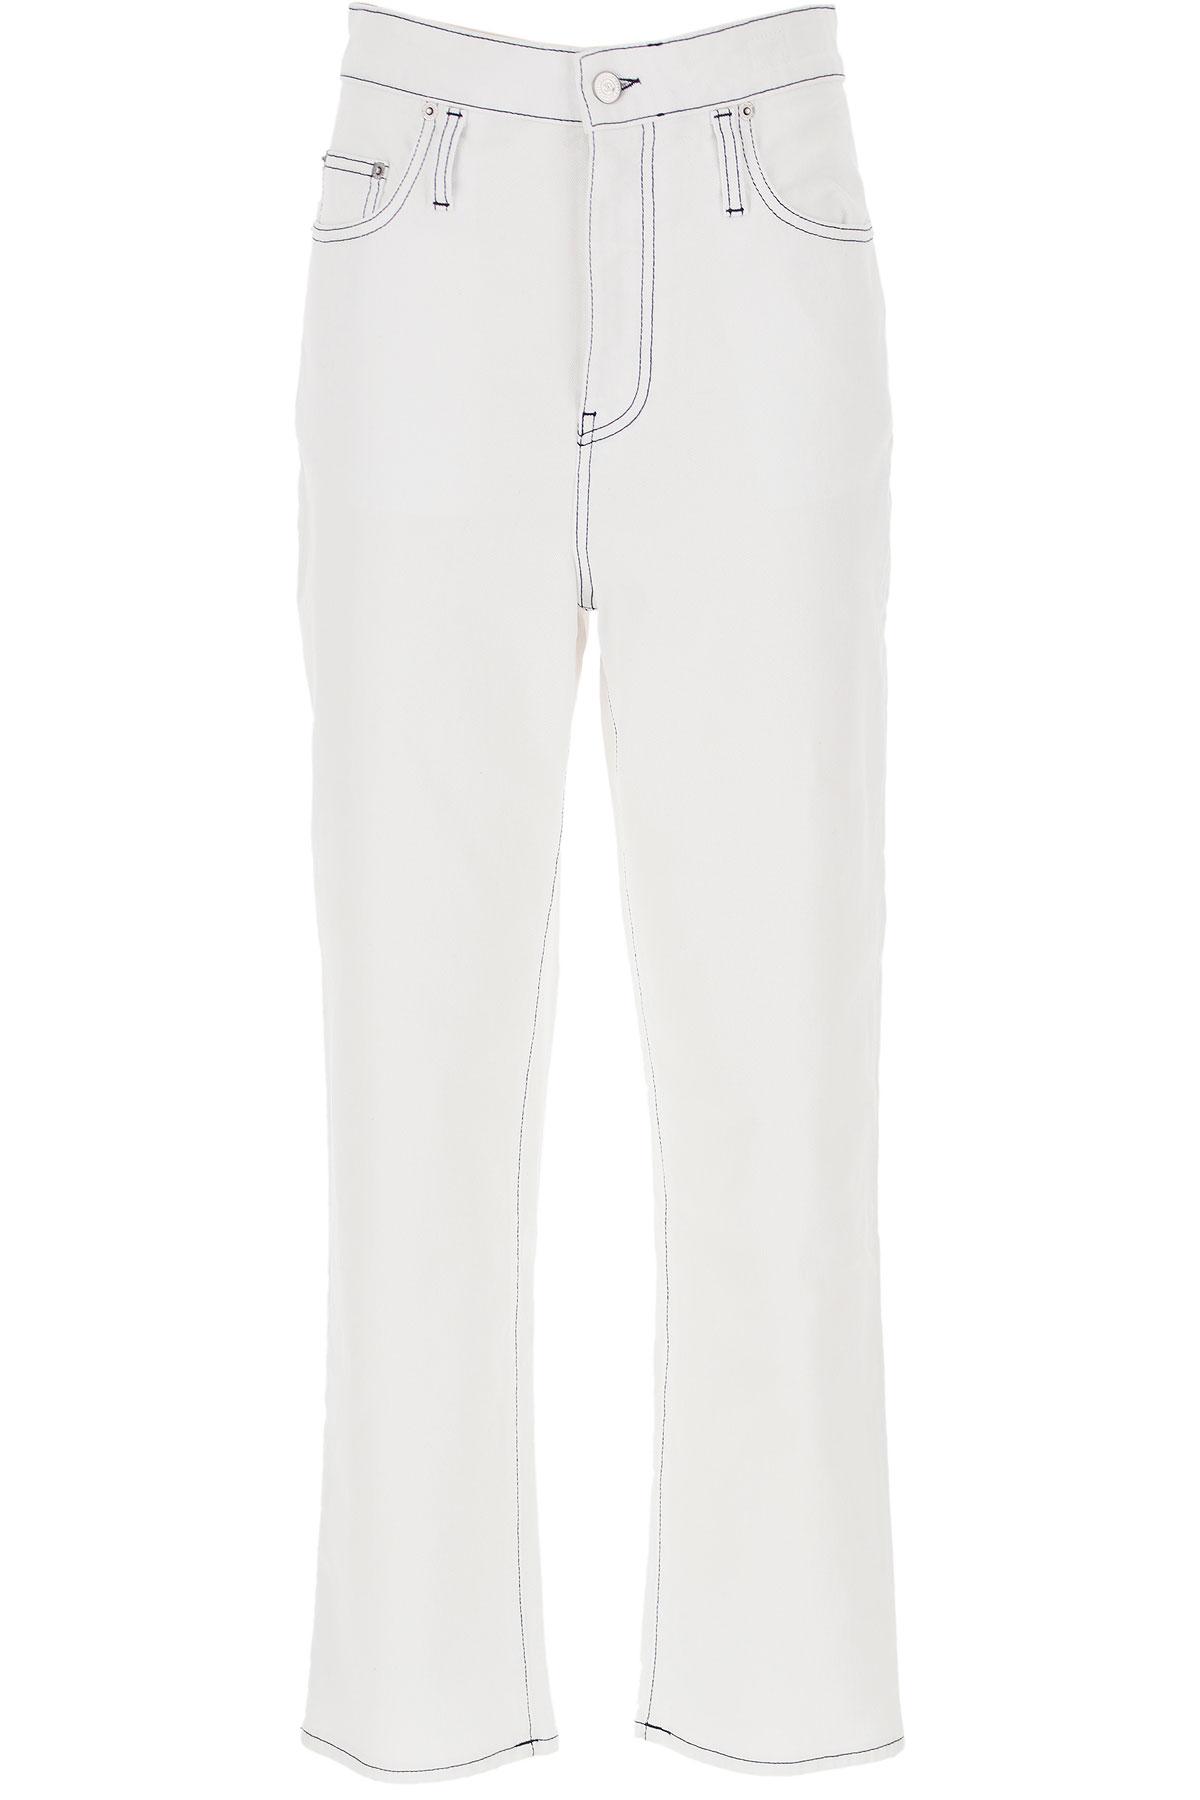 Department Five Jeans On Sale, White, Cotton, 2019, 25 26 27 28 30